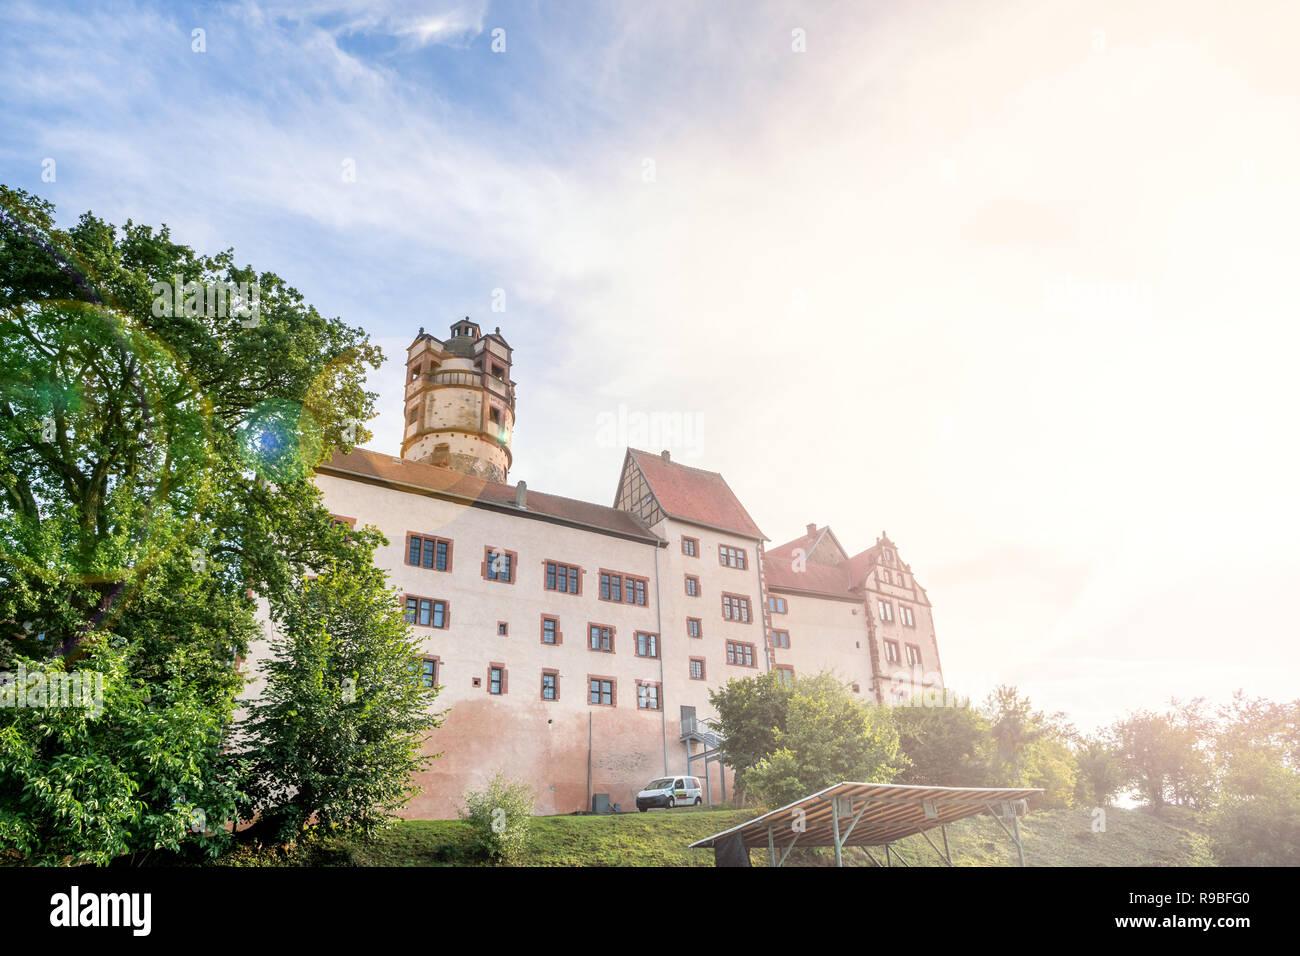 Ronneburg, Germany Stock Photo